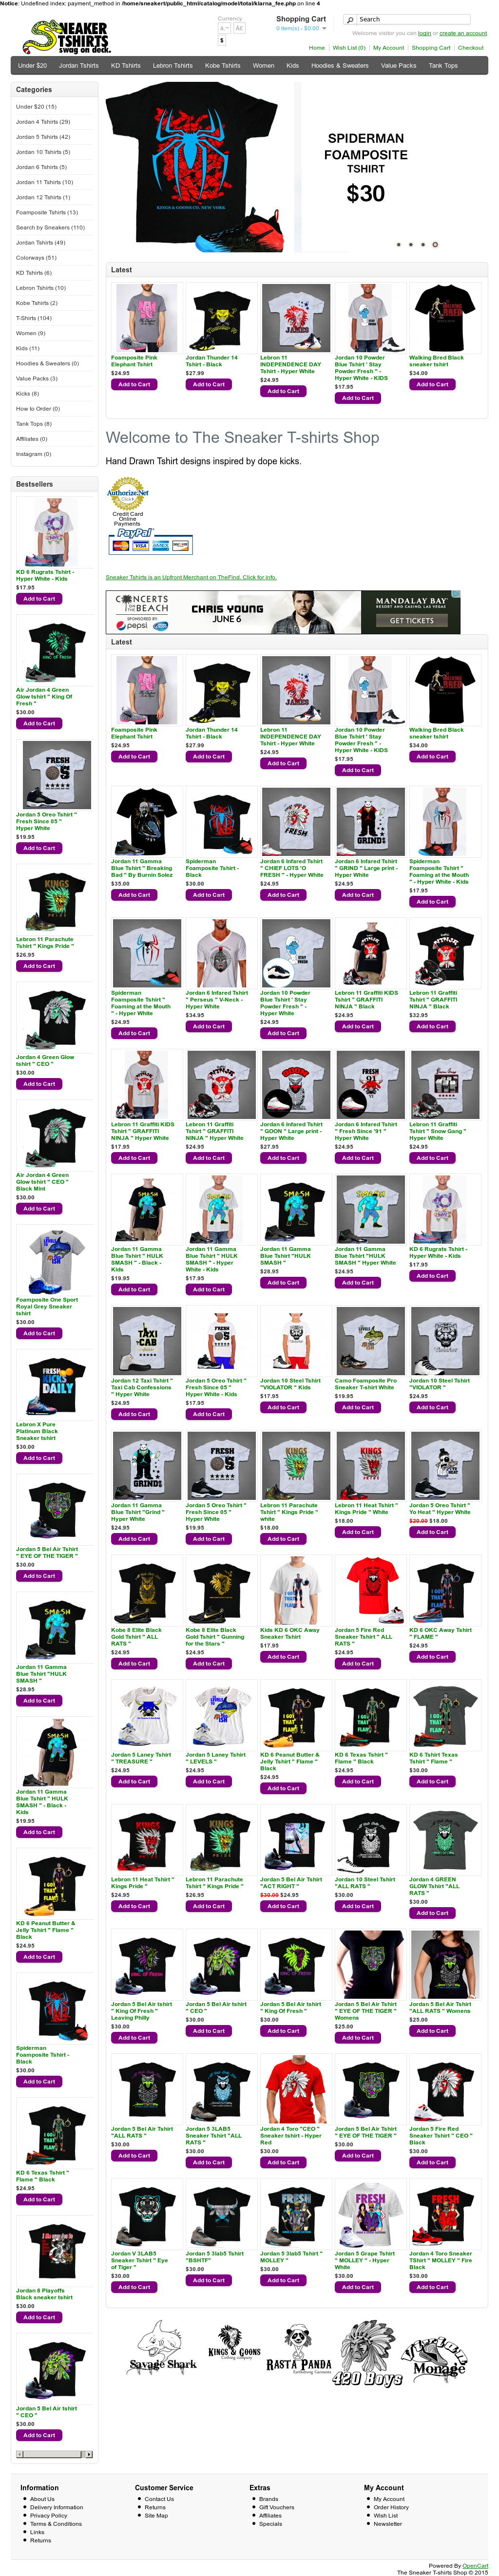 6e1b6a7453a7 The Sneaker T-shirts Shop Competitors